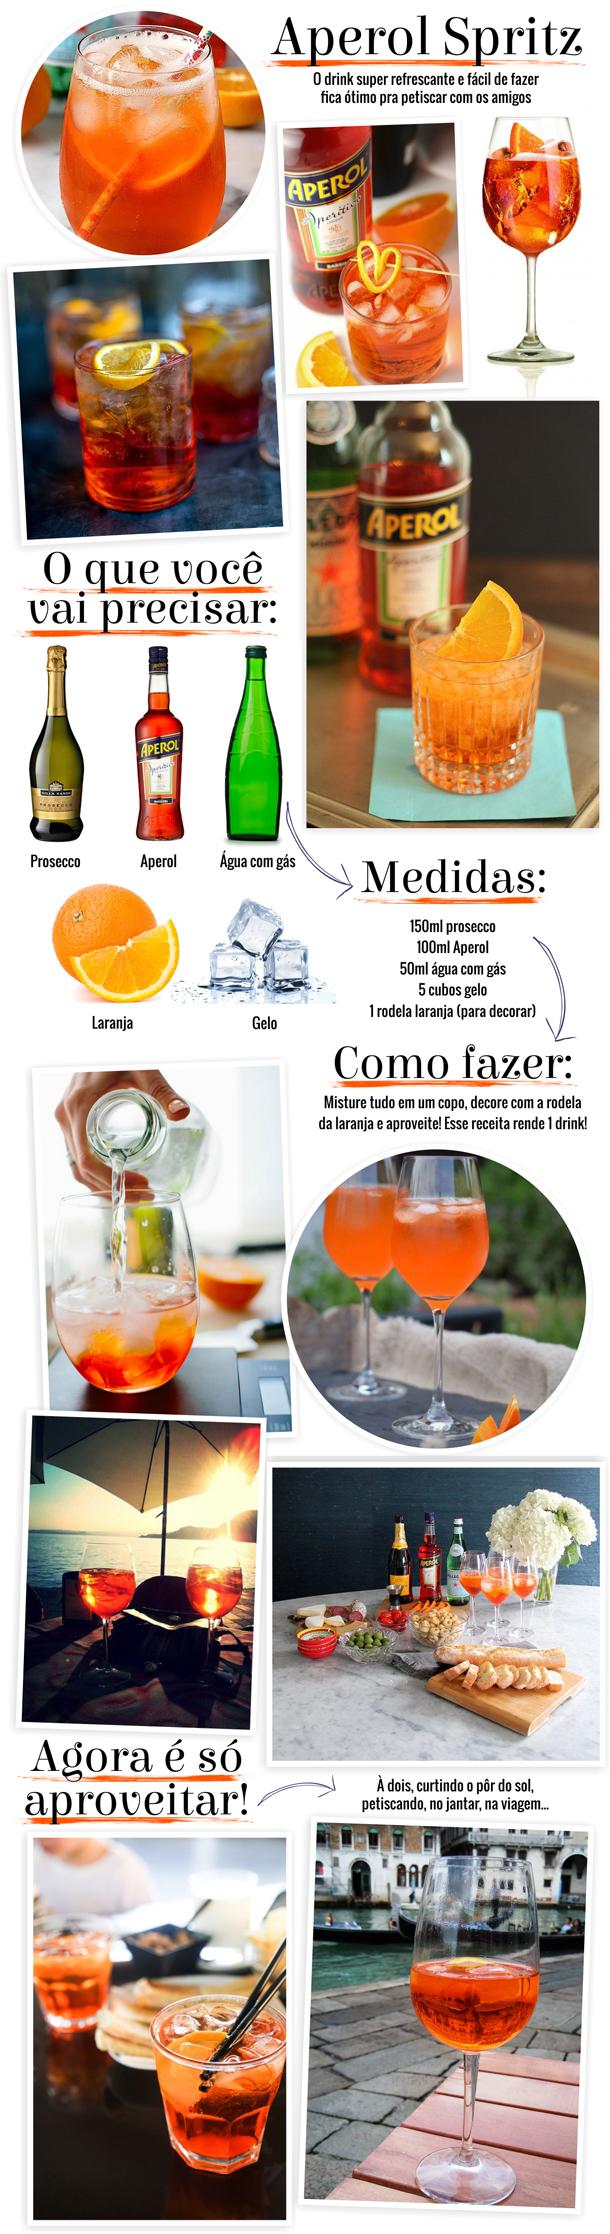 mundo-lolita-drink-receita-aperol-spritz